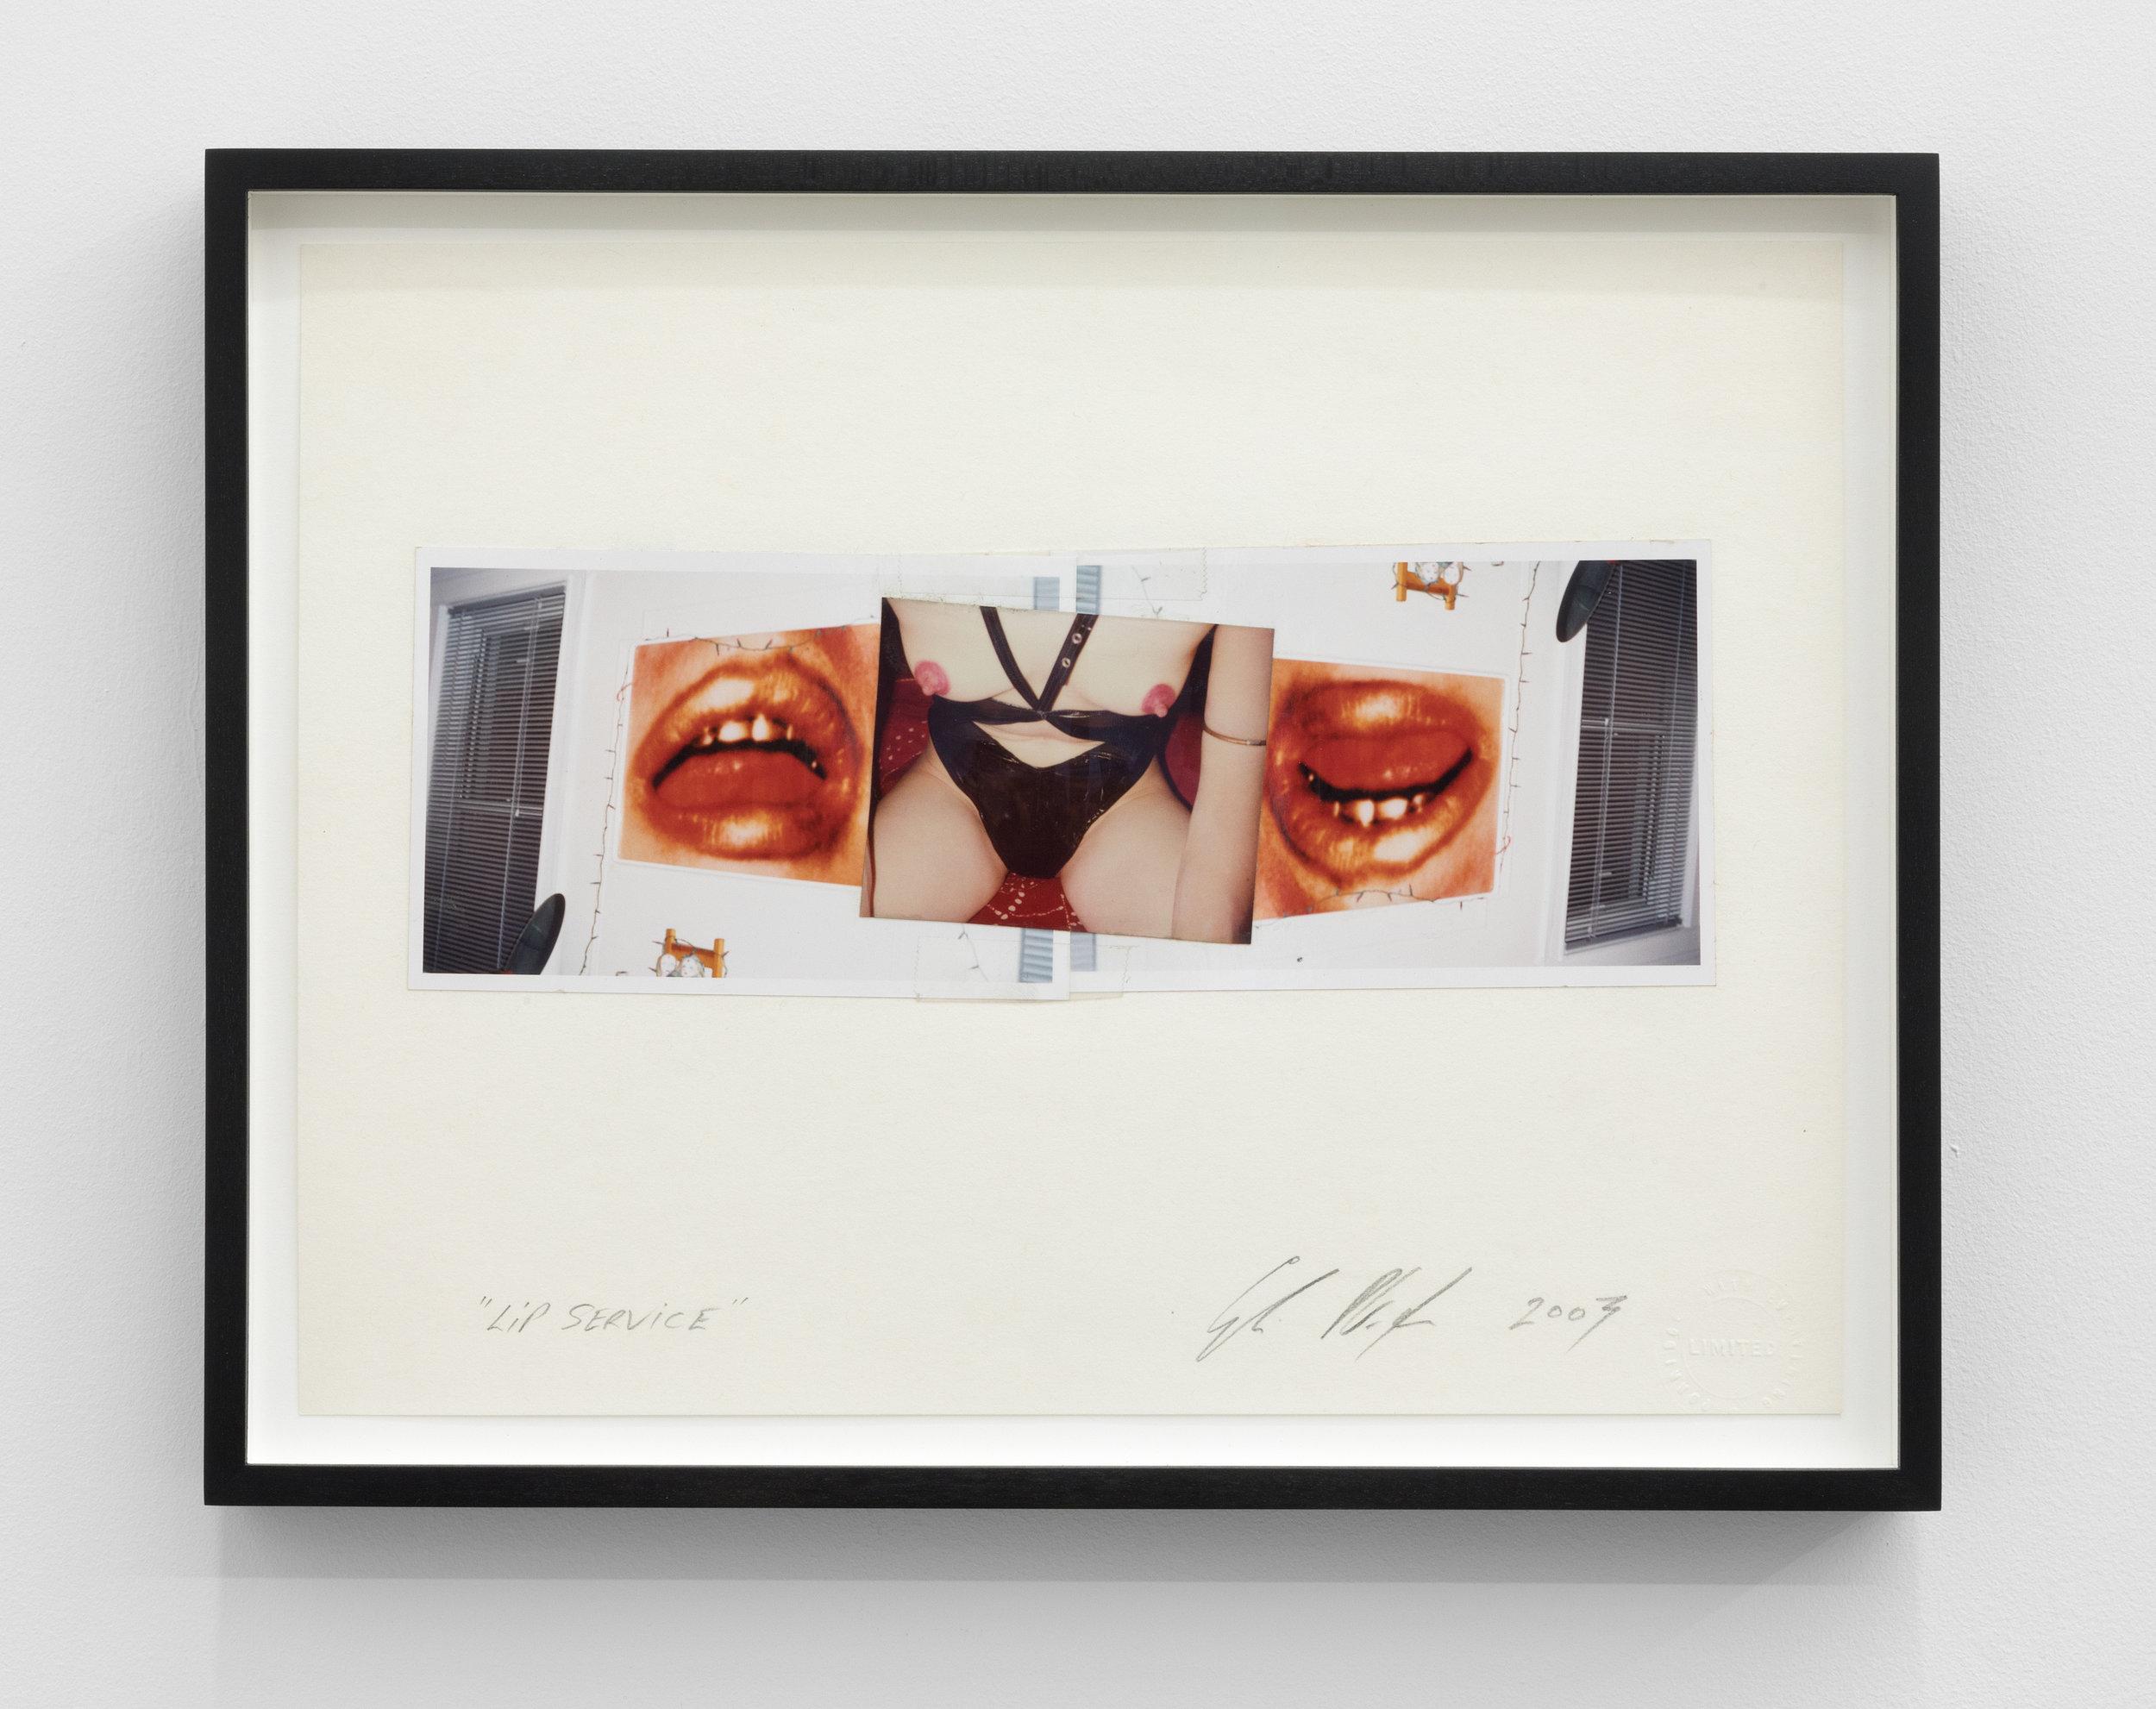 Genesis BREYER P-ORRIDGE,  Lip Service , 2009, Mixed Media, 10,25 x 14 in